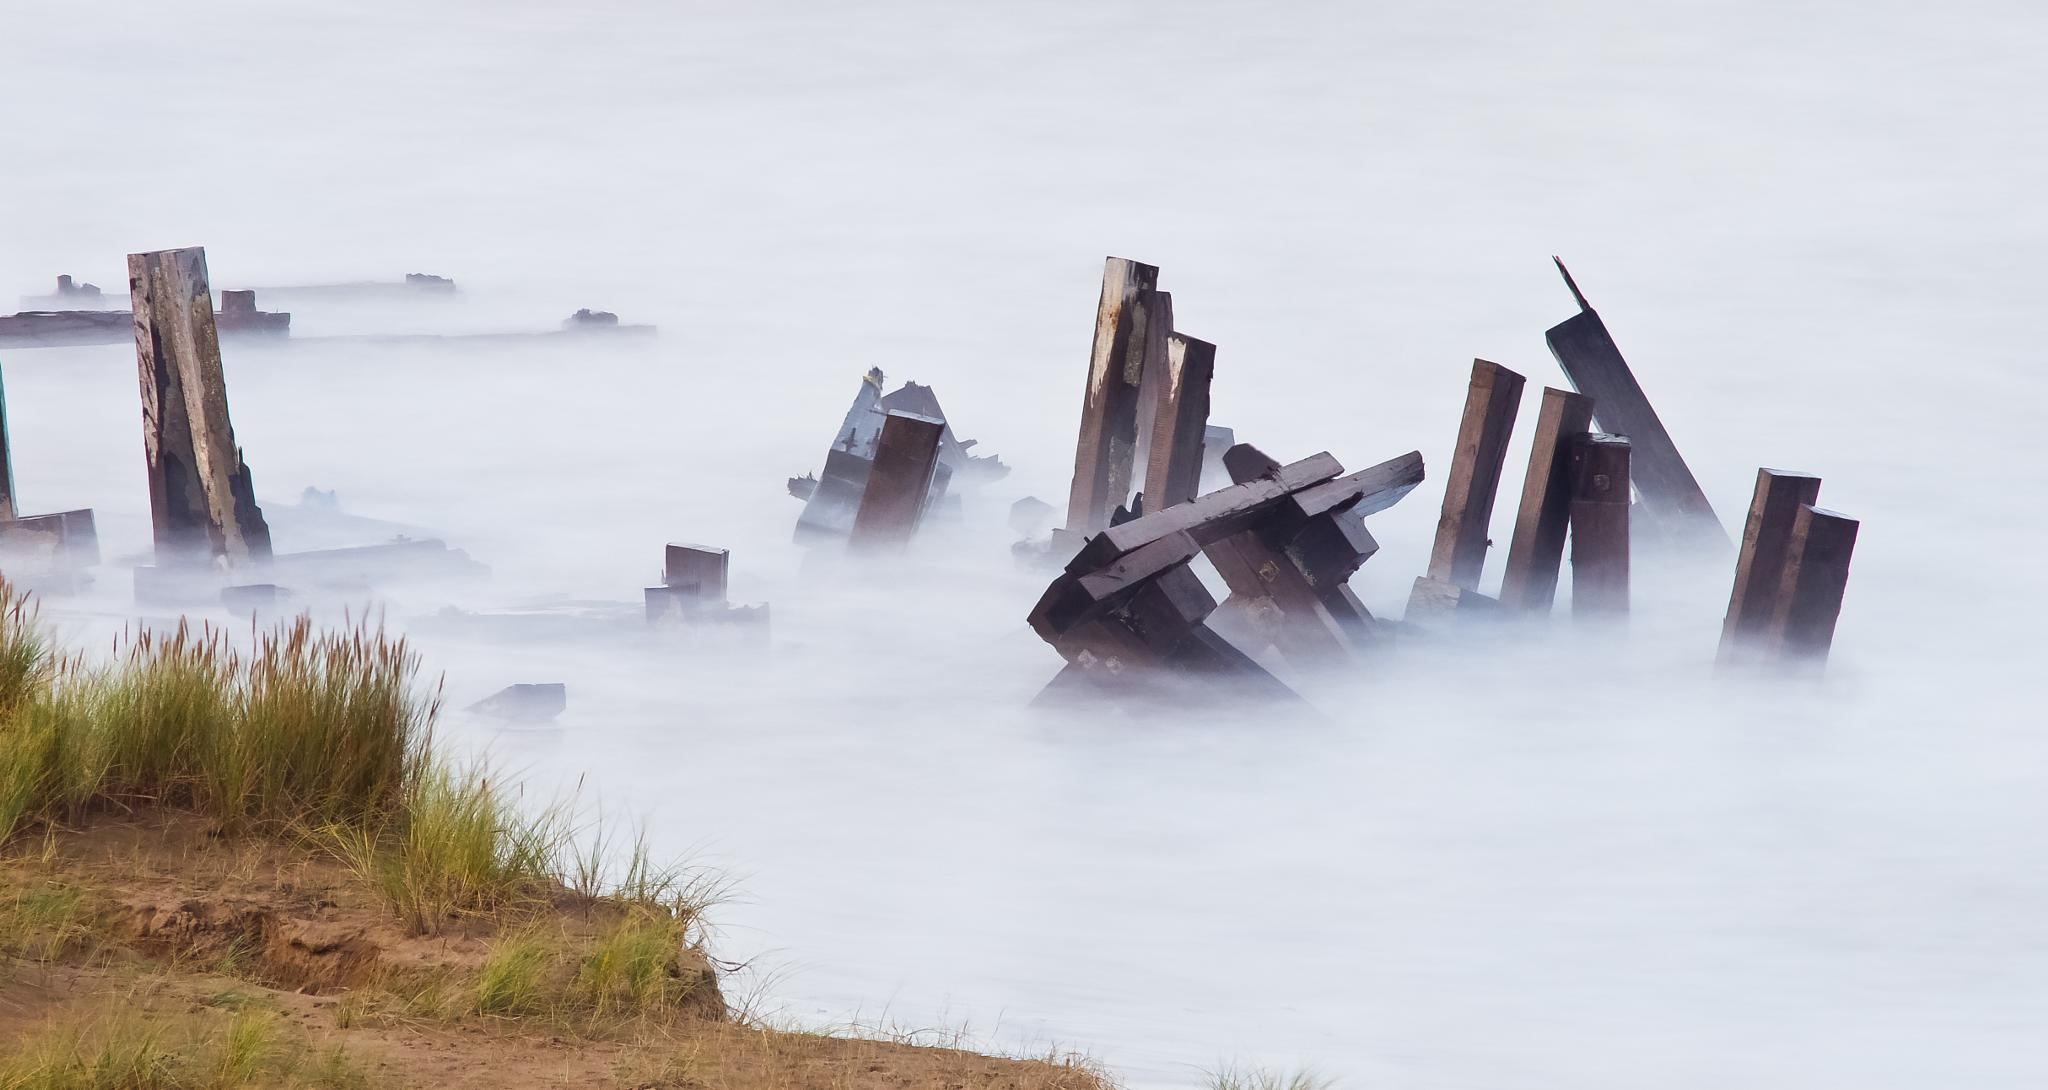 Broken jetty by Peter Edwardo Vicente.